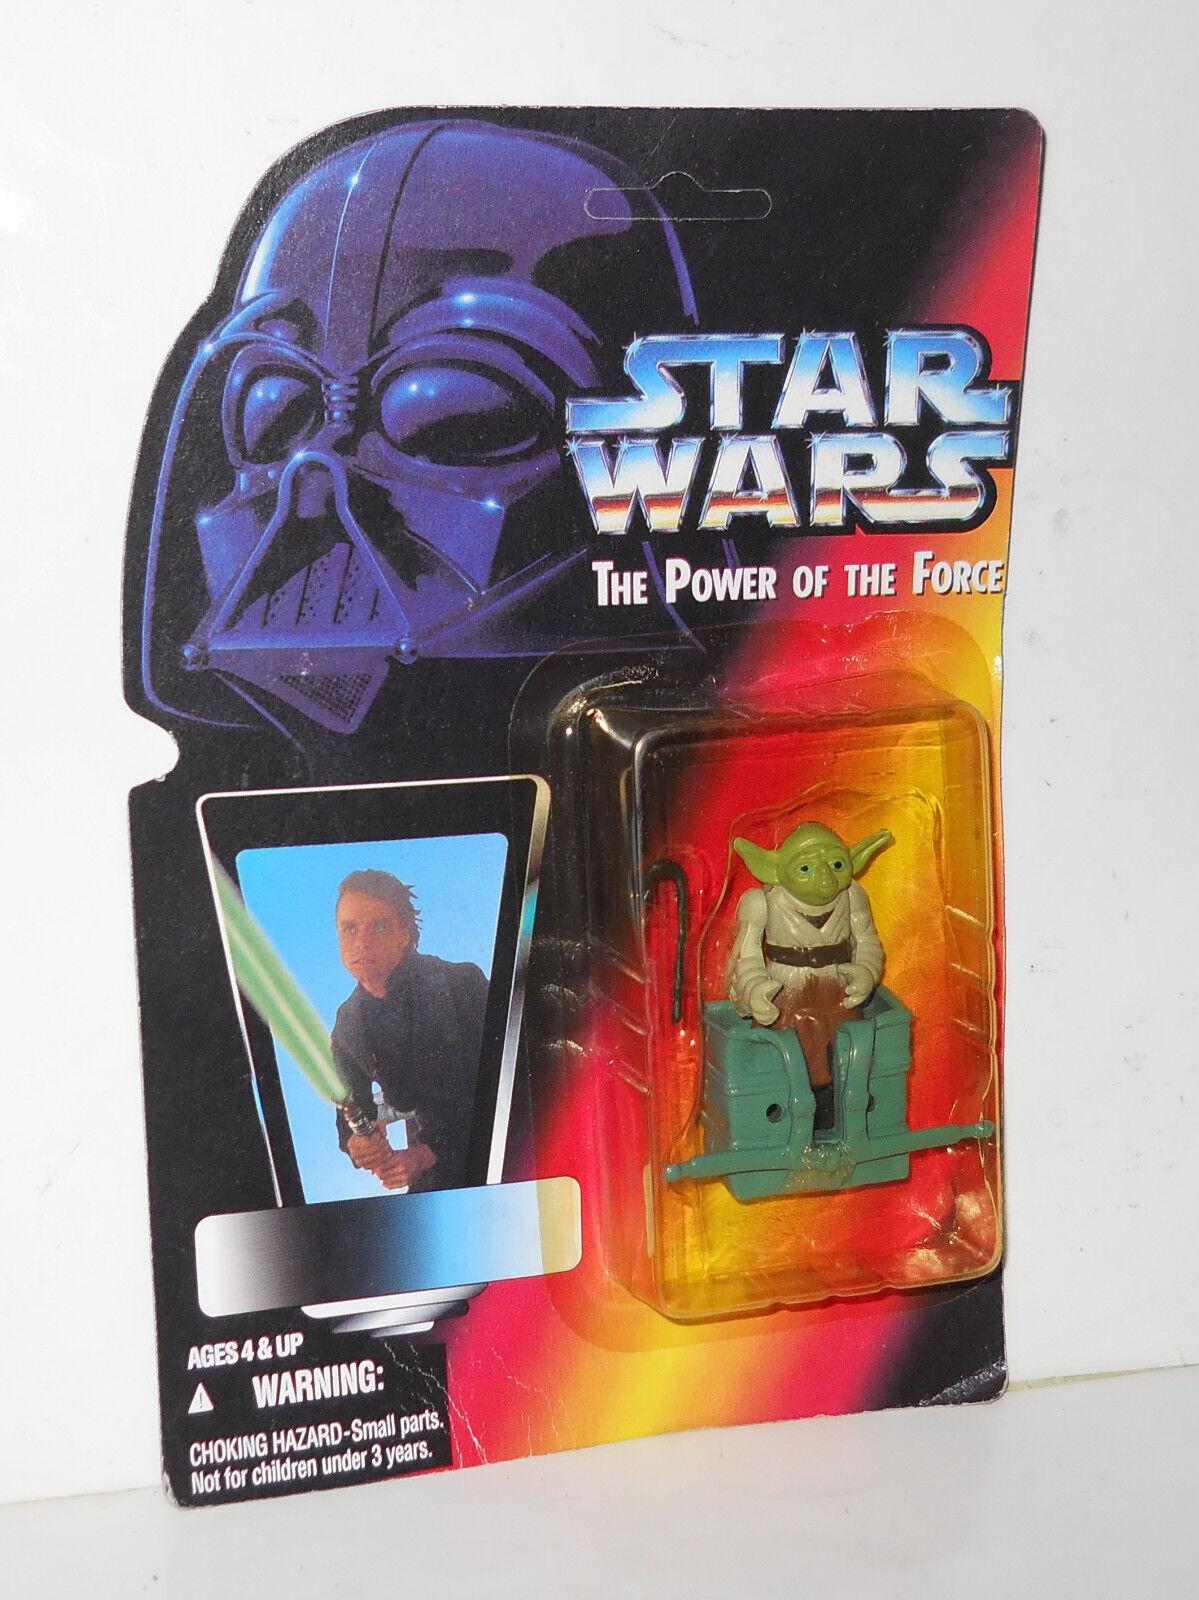 Figura De Estrella Wars Yoda botaleg Variante Rara menta en tarjeta ENLOMADOR Raro